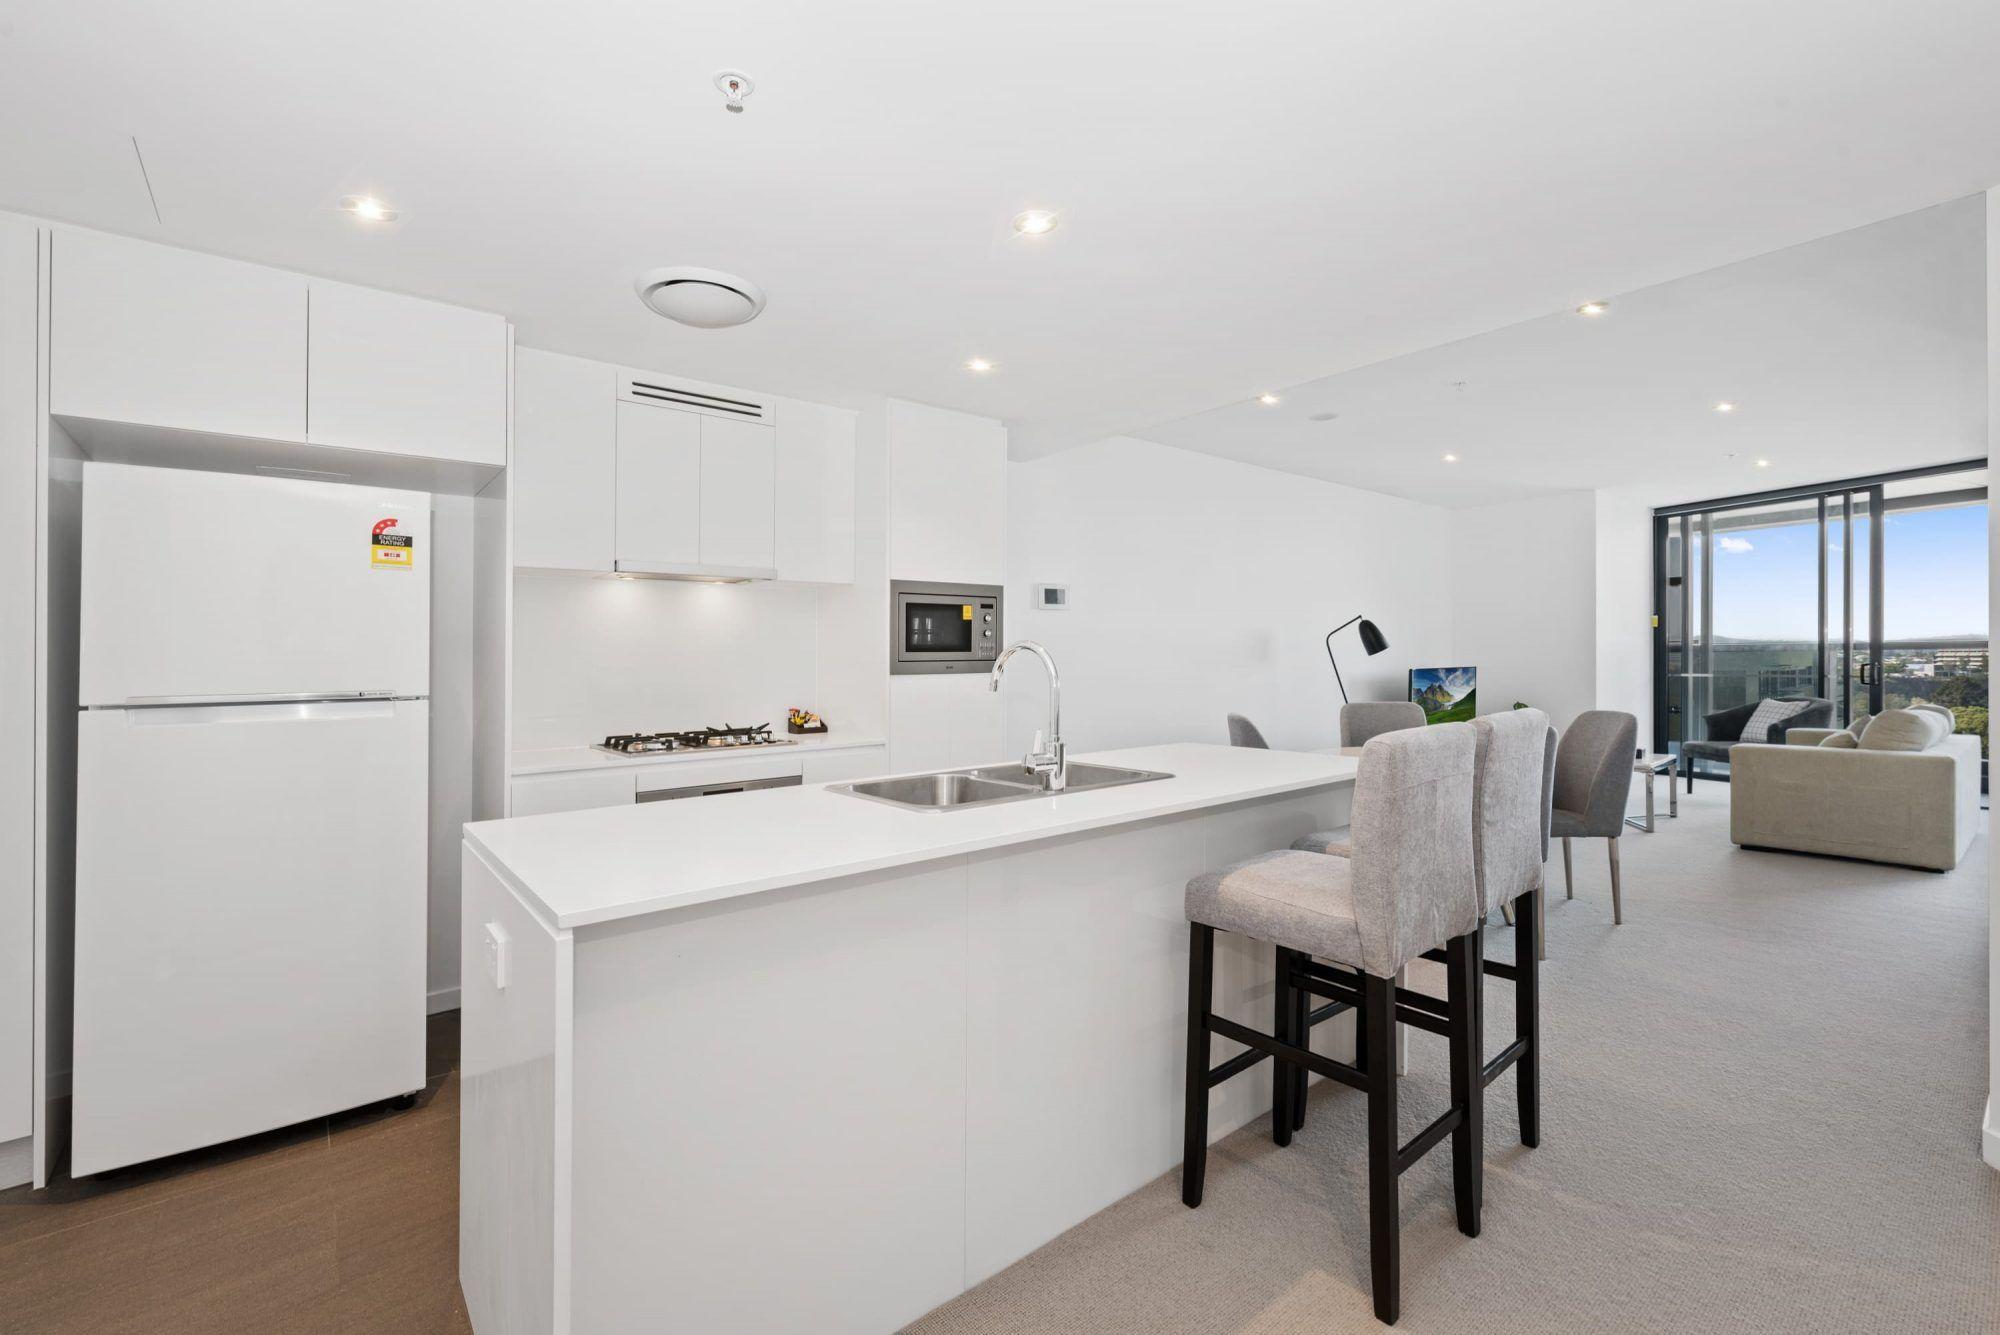 Cheap 2 Bedroom Apartments Brisbane For Rent Home Decorations Idea